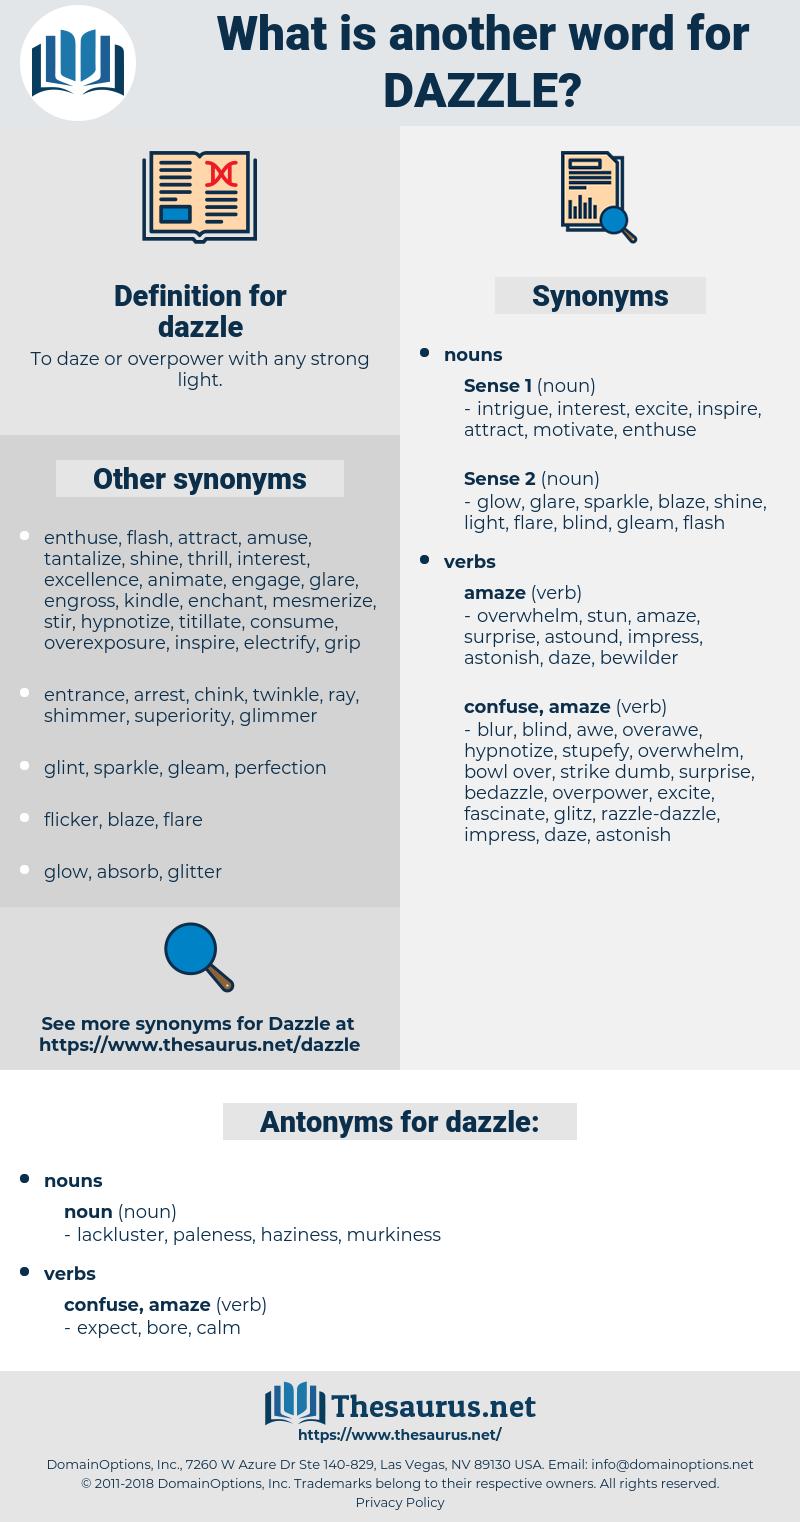 dazzle, synonym dazzle, another word for dazzle, words like dazzle, thesaurus dazzle